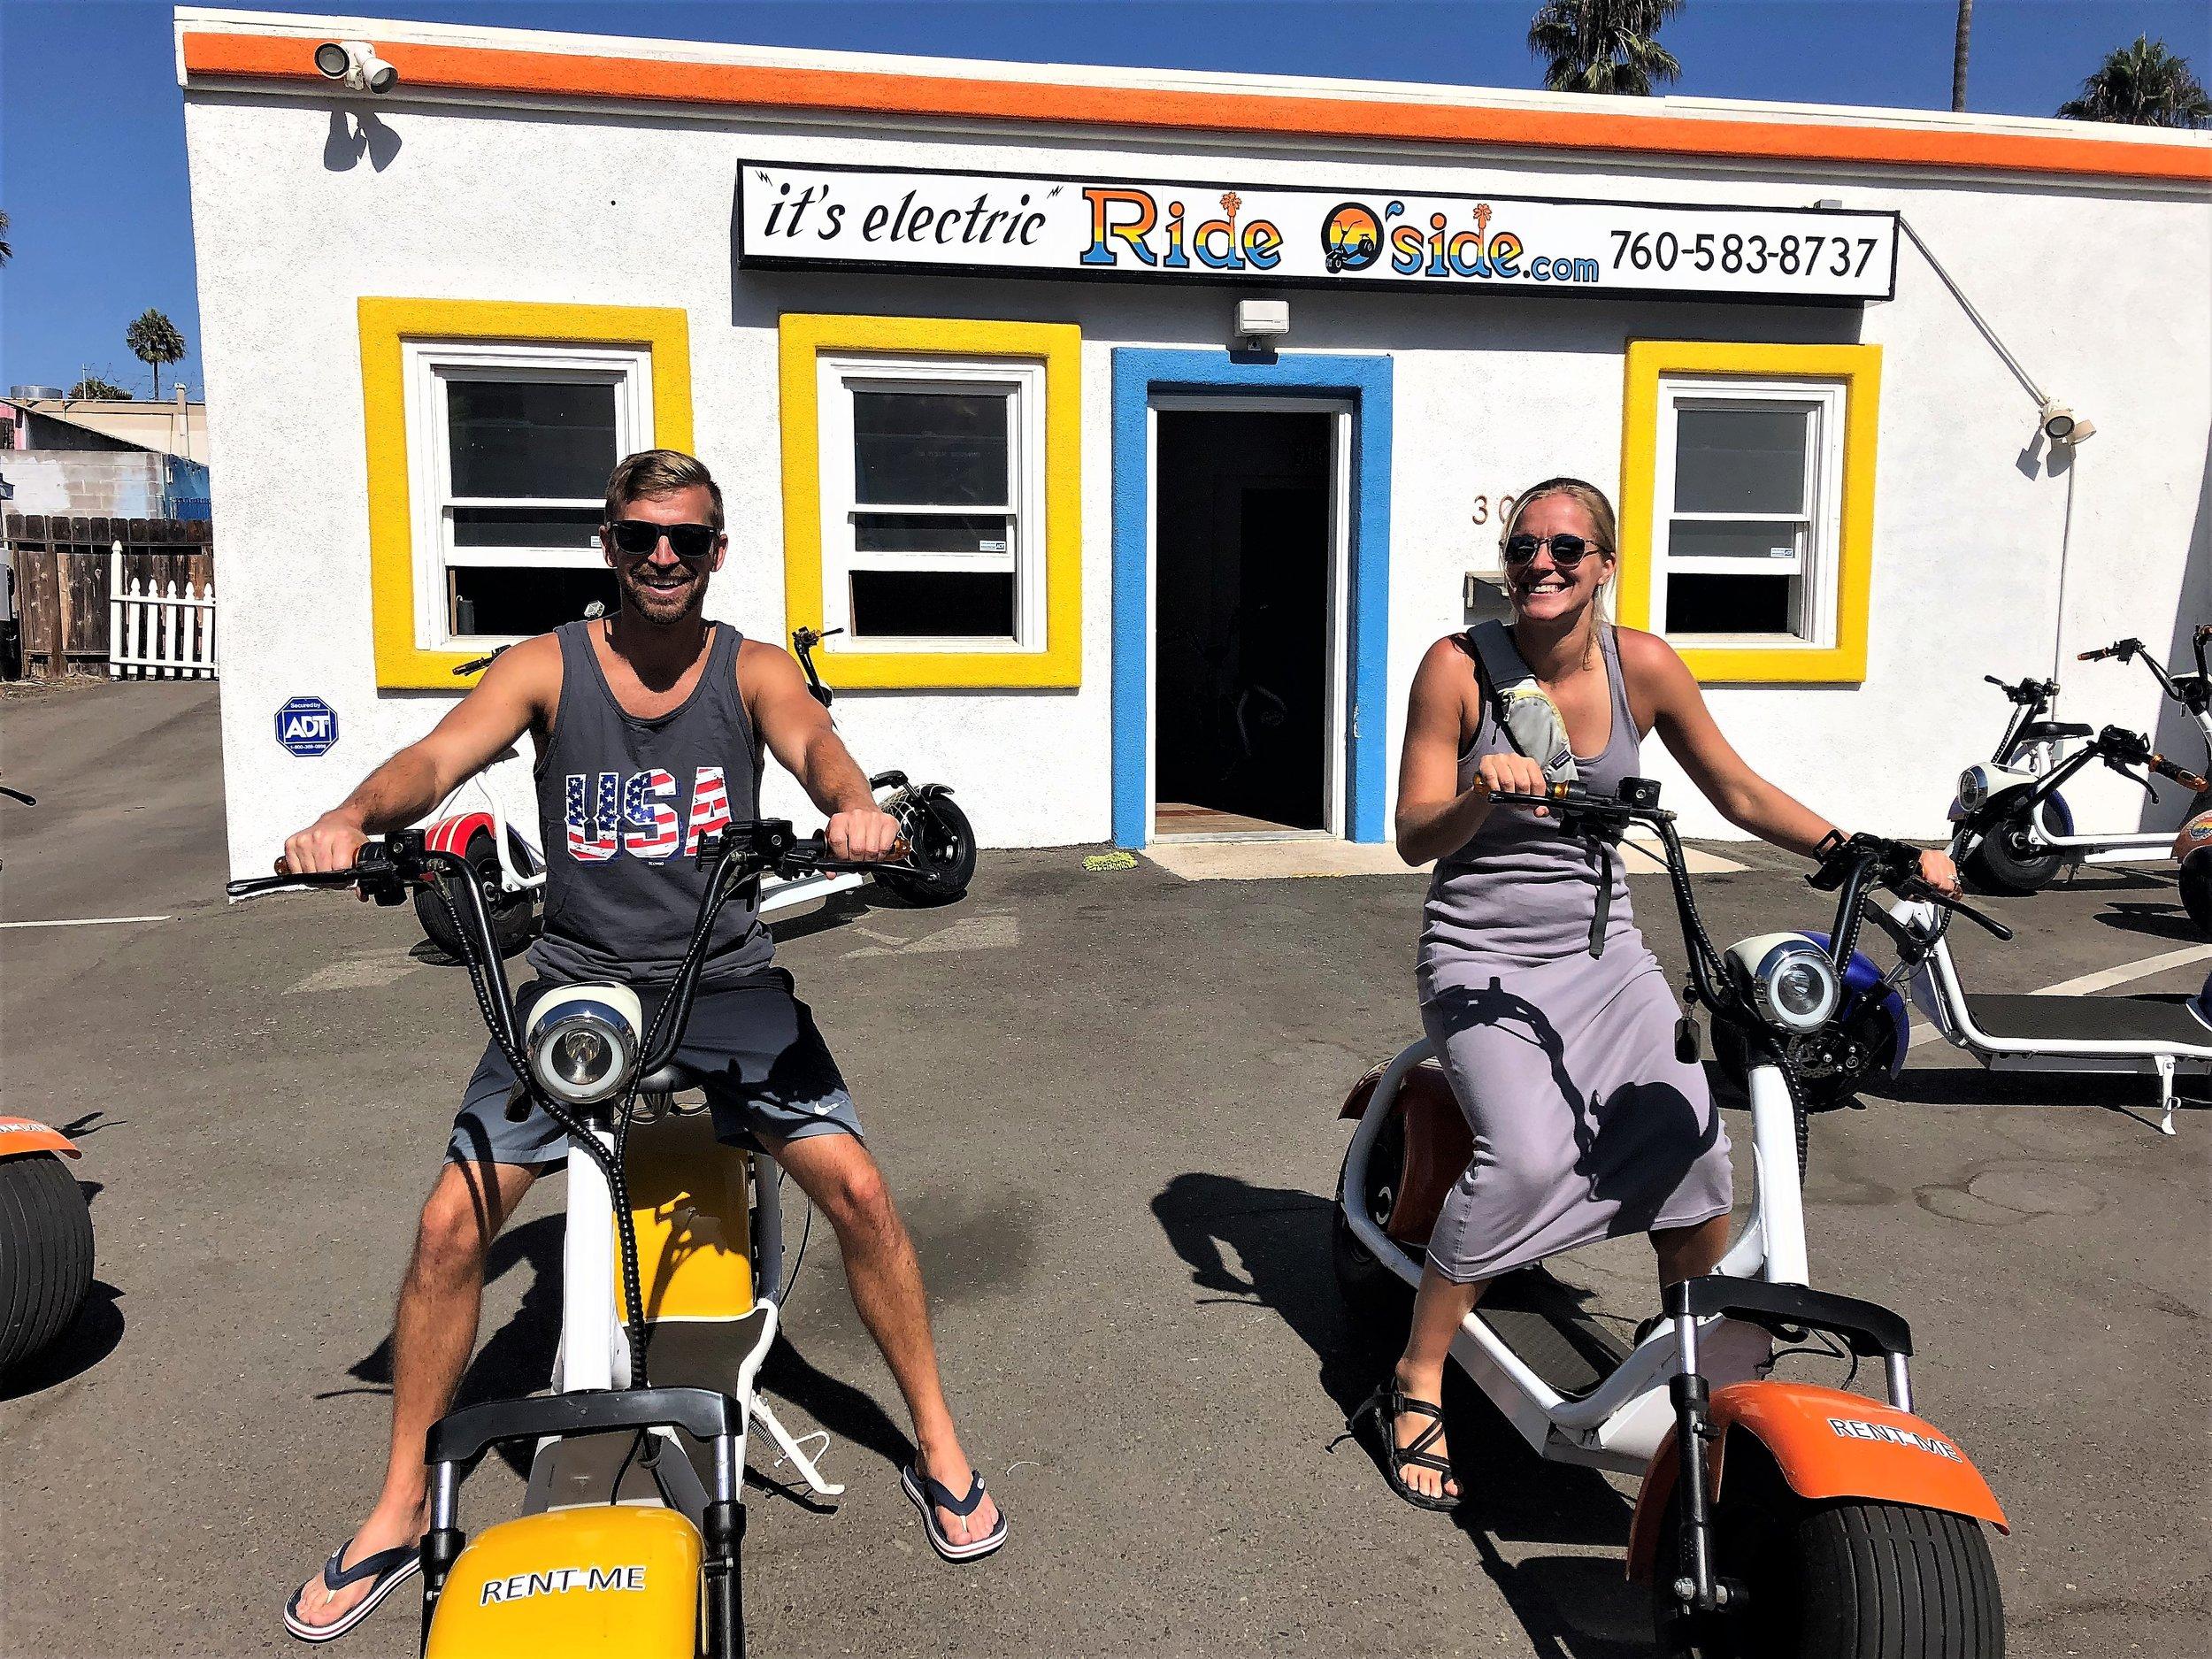 electric scooter rental.JPG